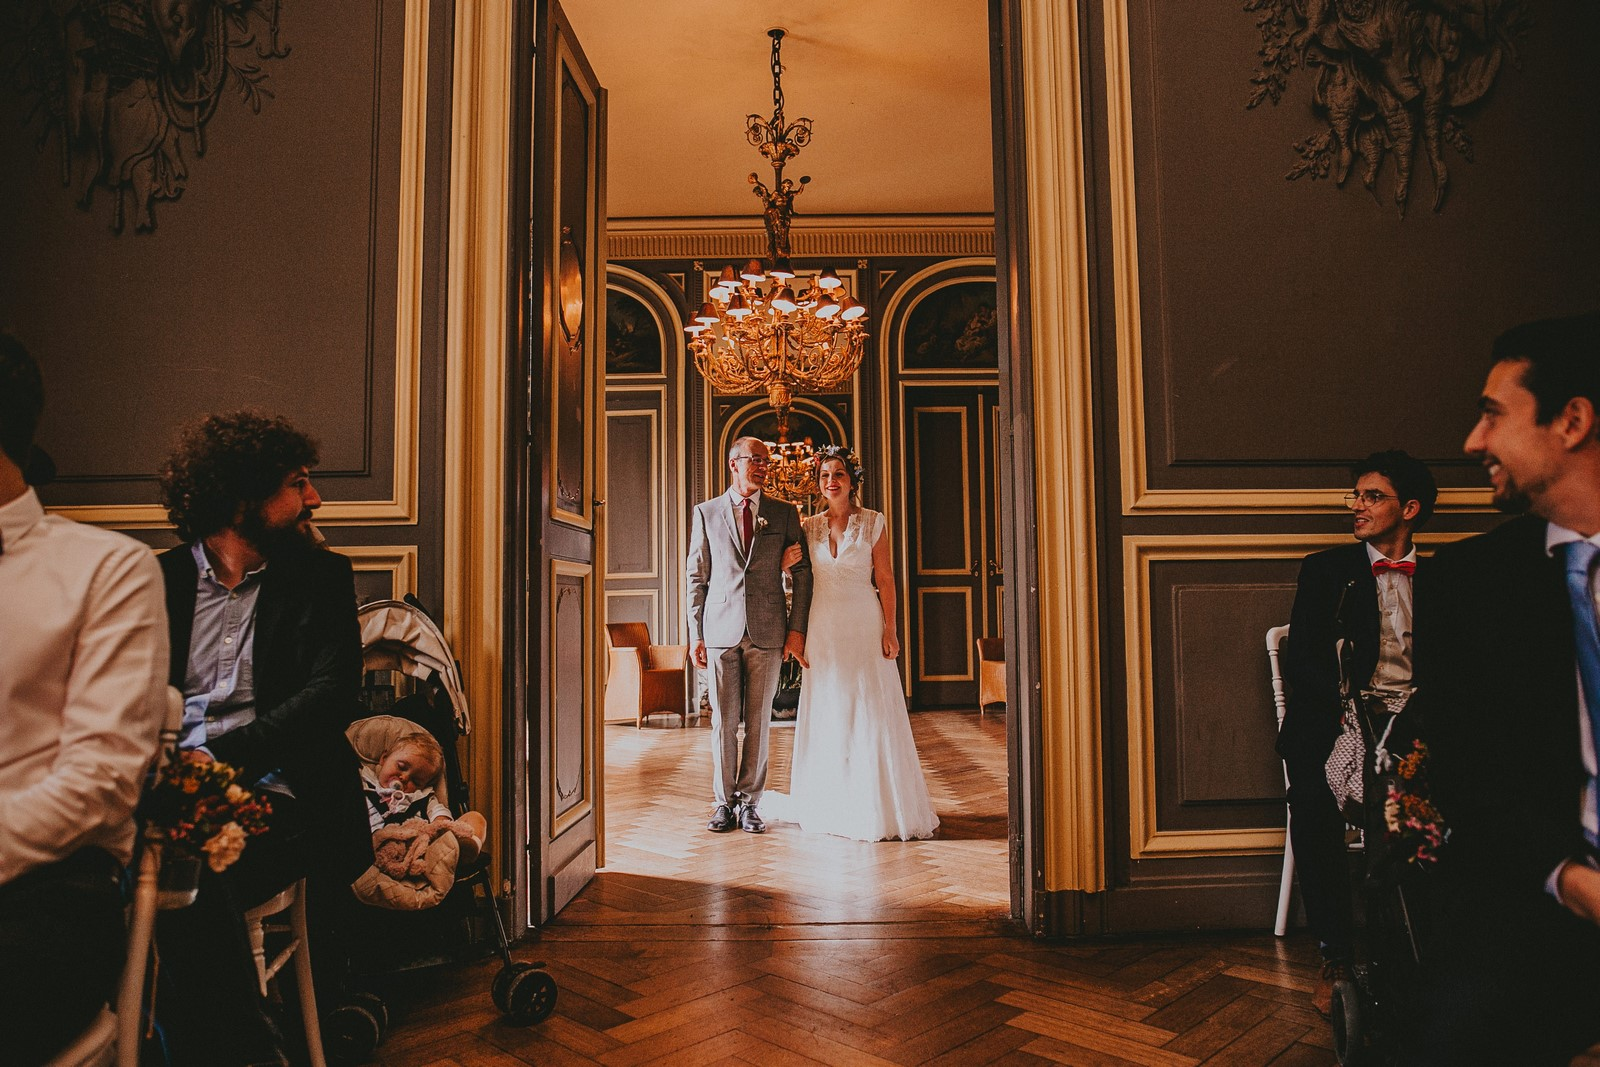 photographe mariage chateau de bourgogne 36